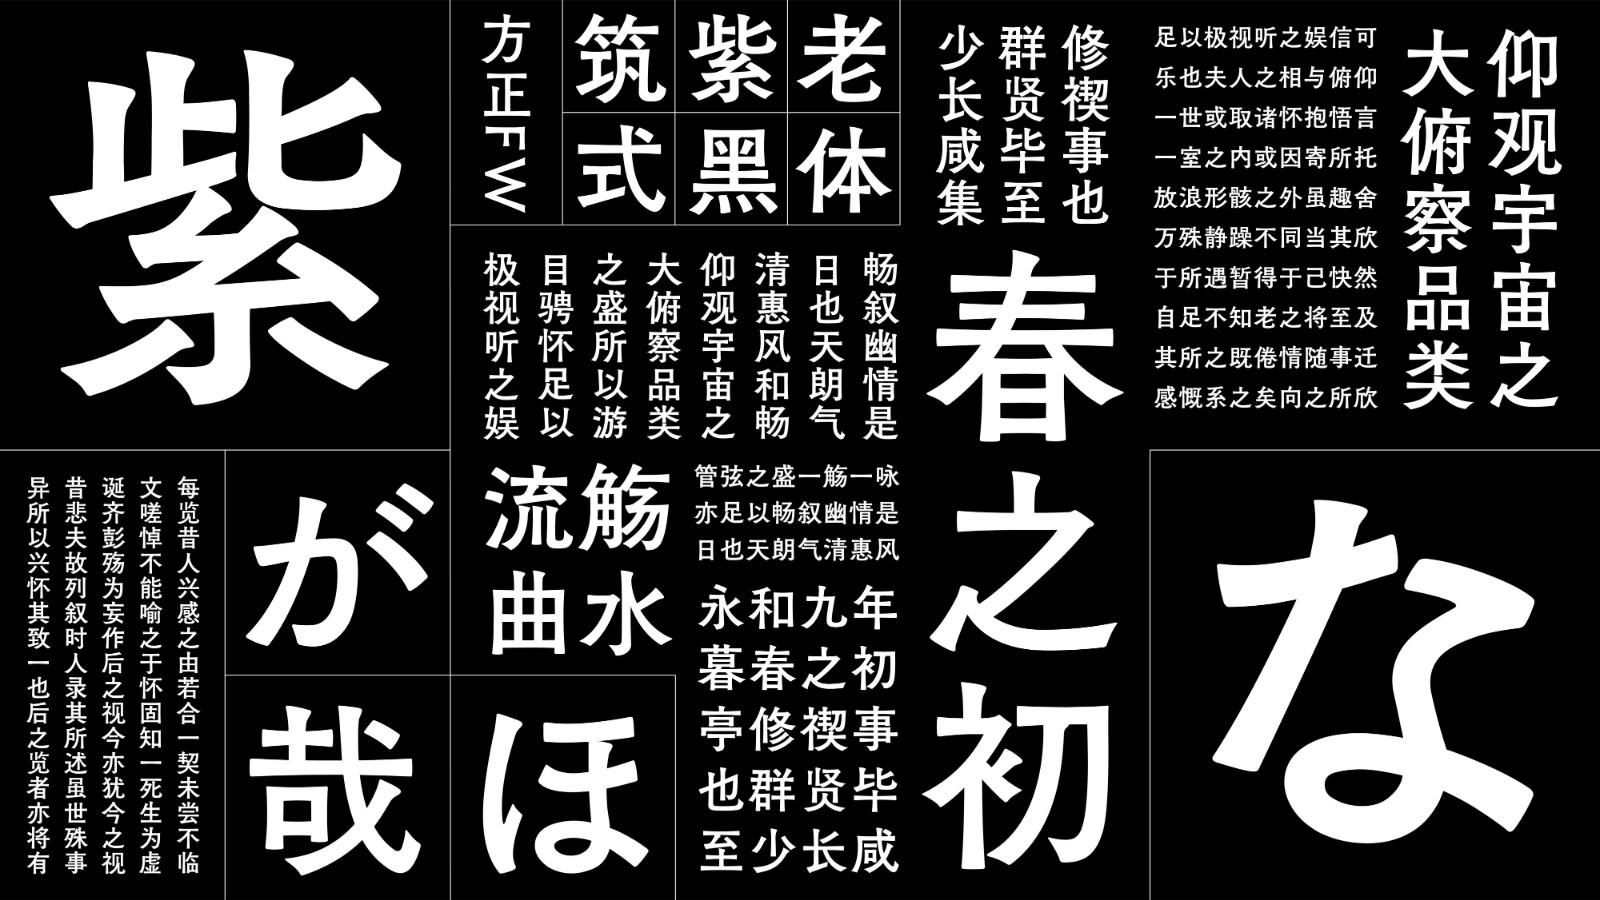 https://ft-bk1.oss-cn-zhangjiakou.aliyuncs.com/Public/Uploads/img/n_content_20201210175725_3240.jpg